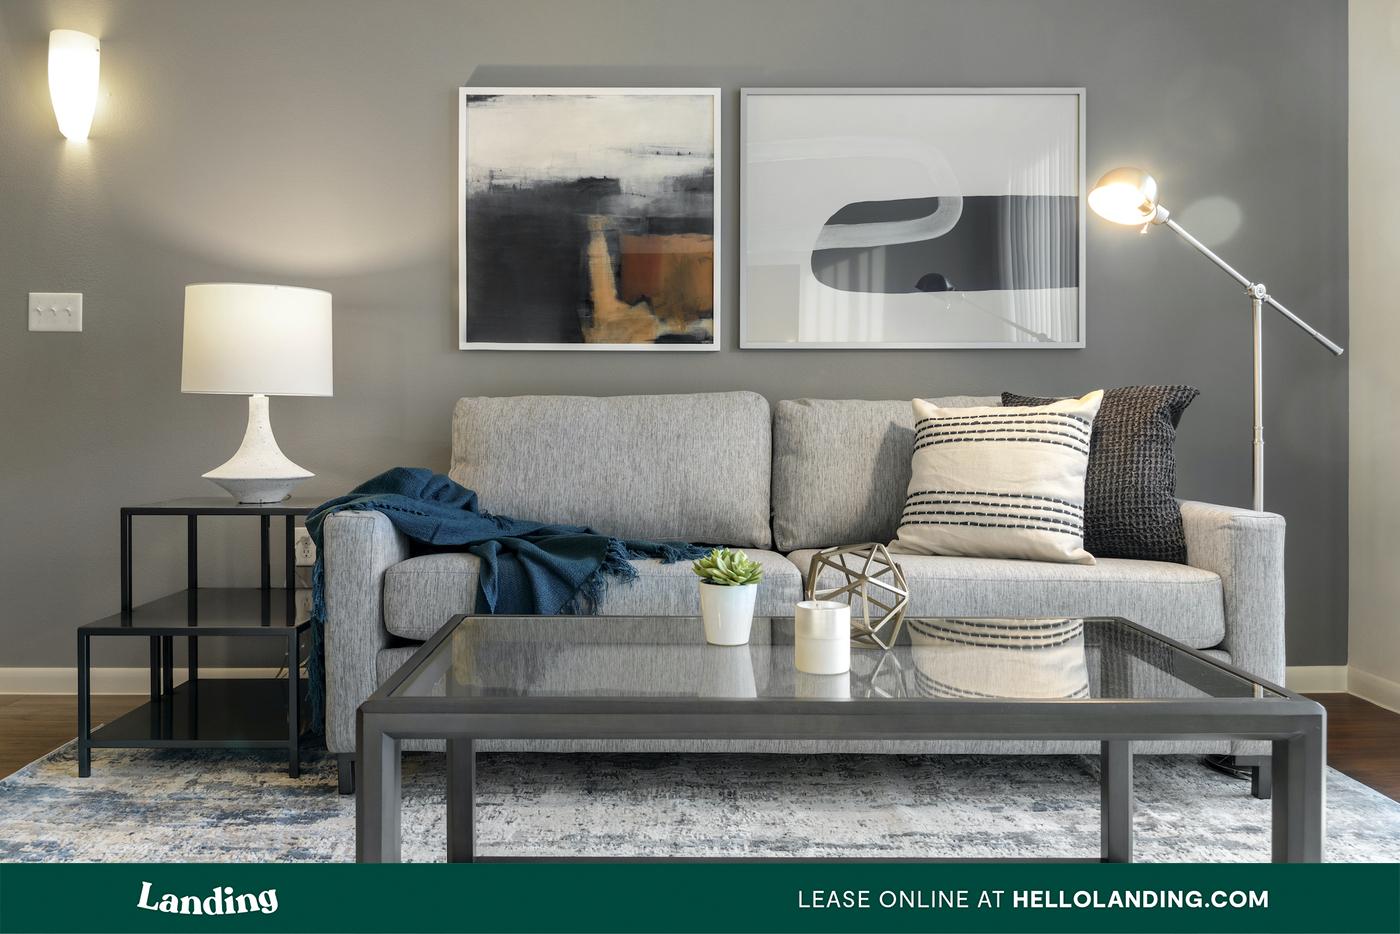 Pecan Springs 08-8208 for rent